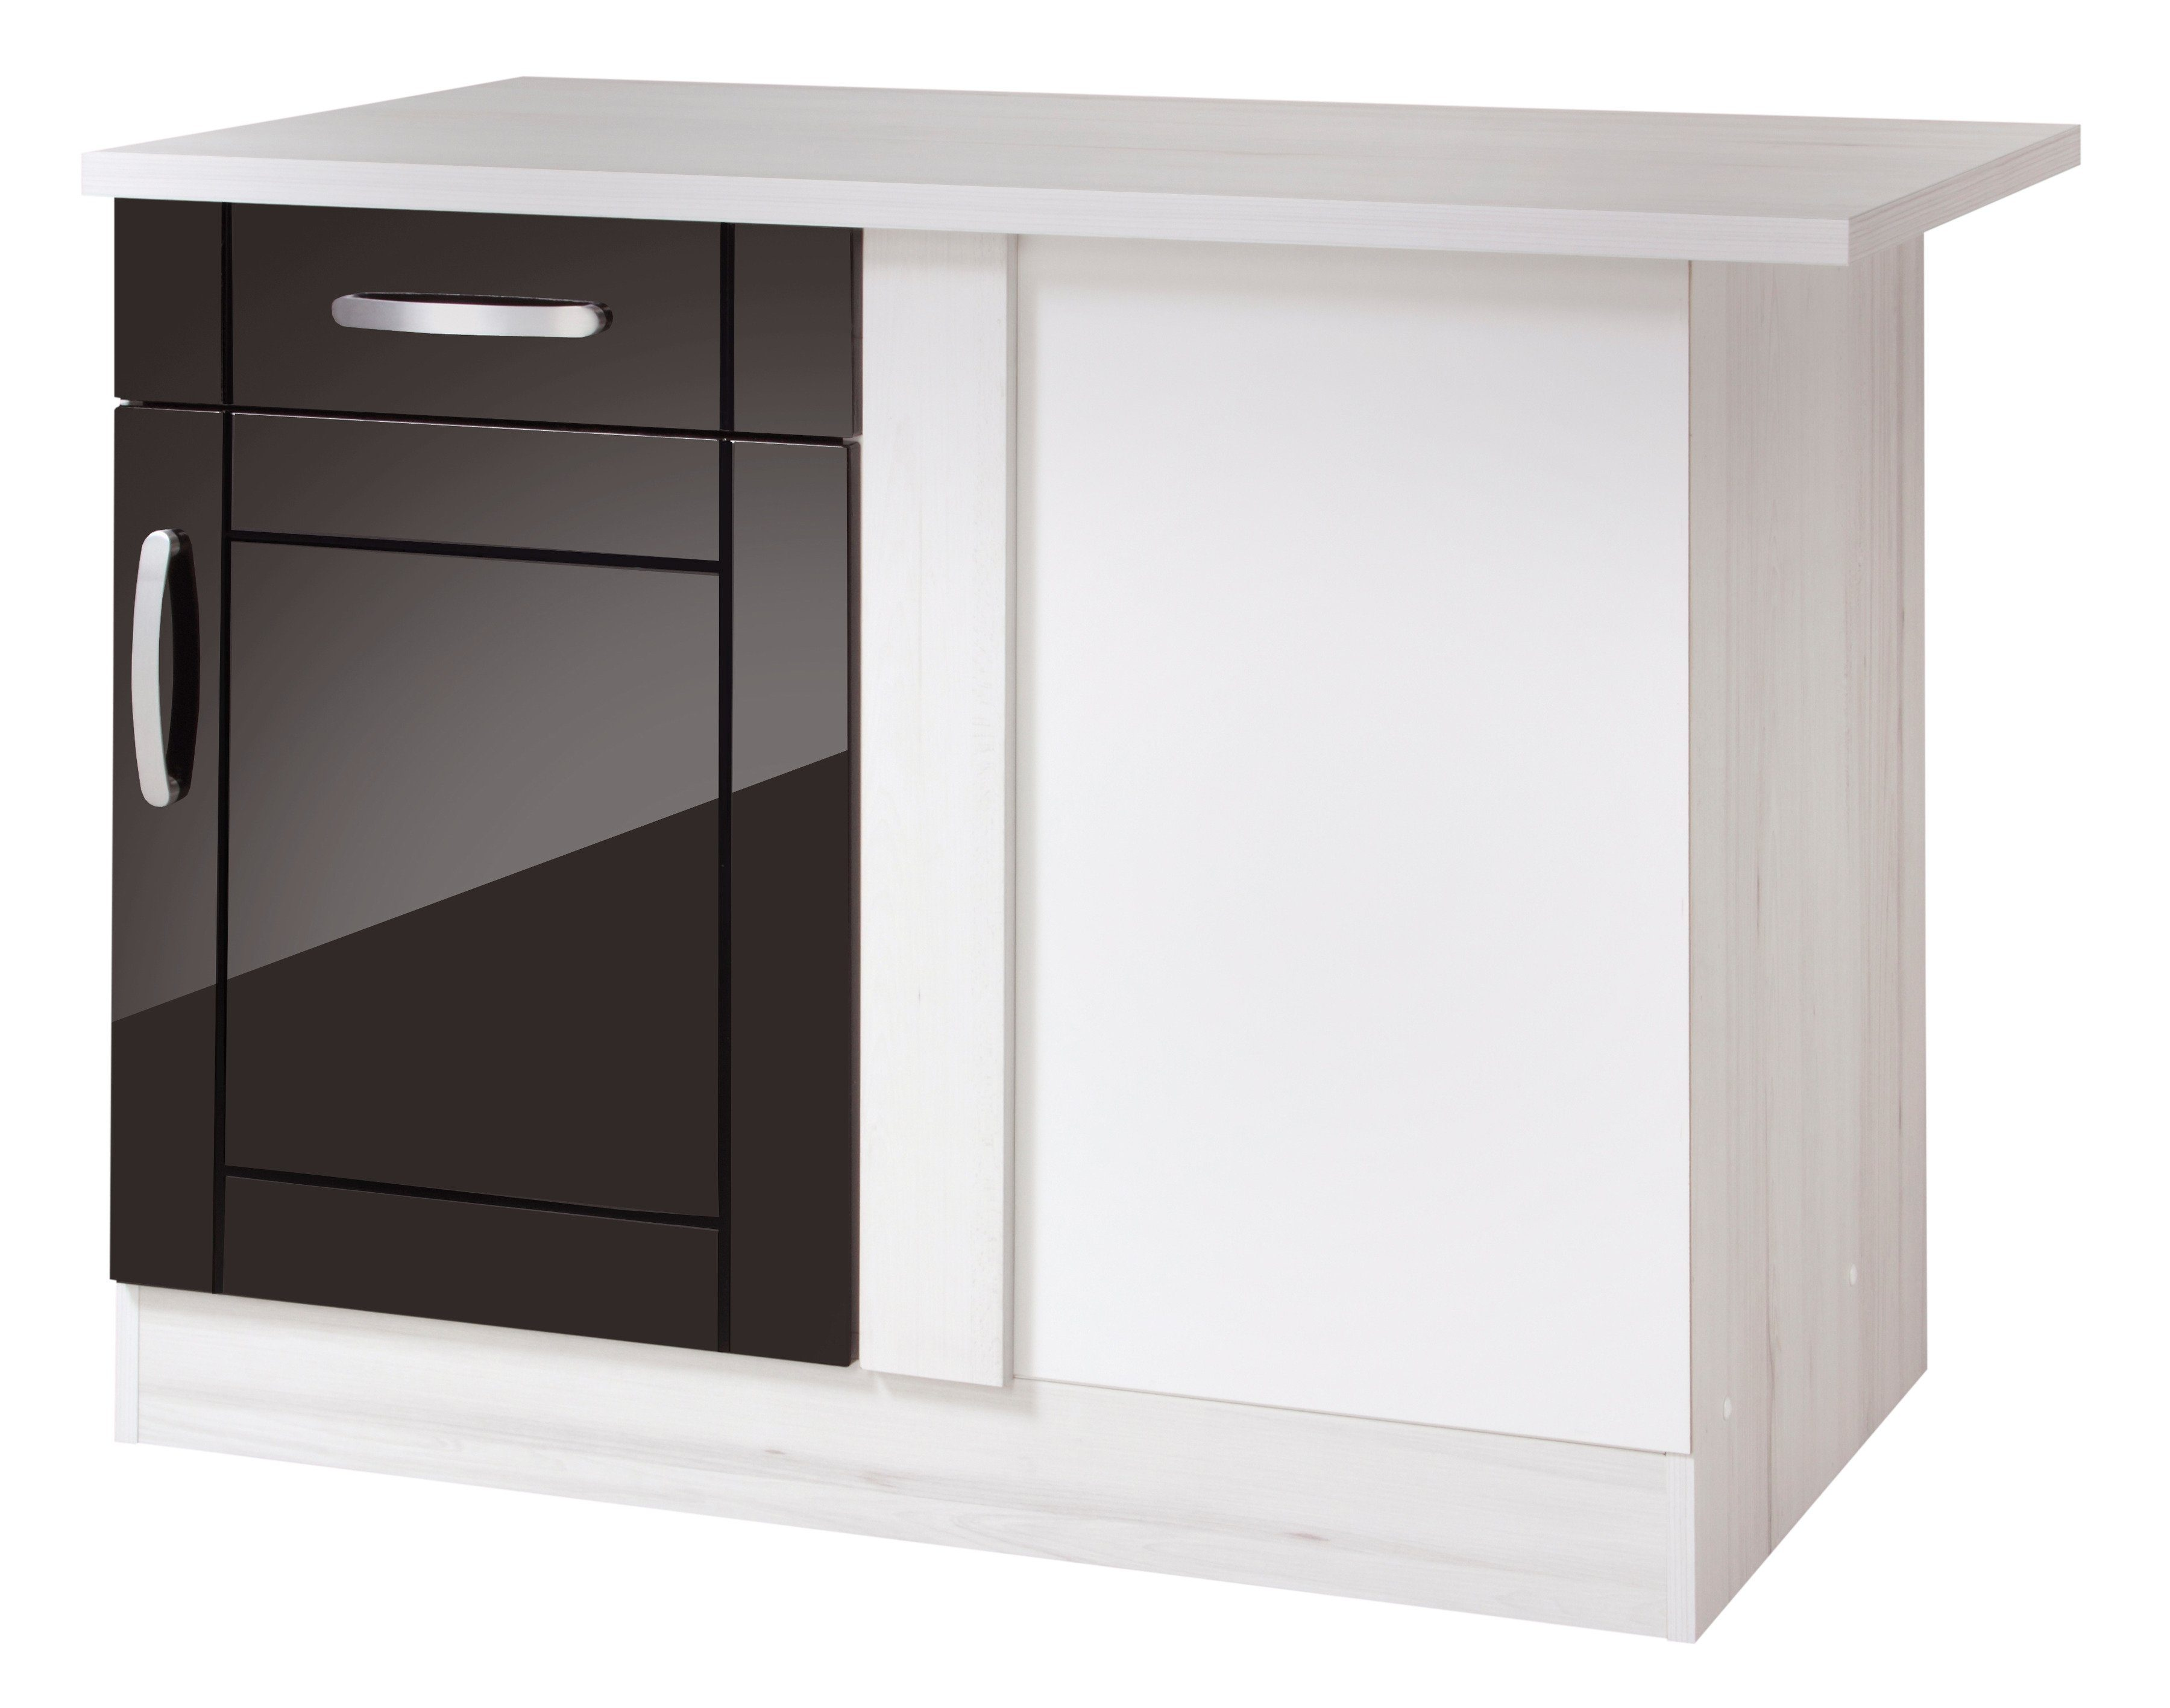 Keukenkast Wit Hoogglans : Keukenkast kopen meer dan keukenkasten otto